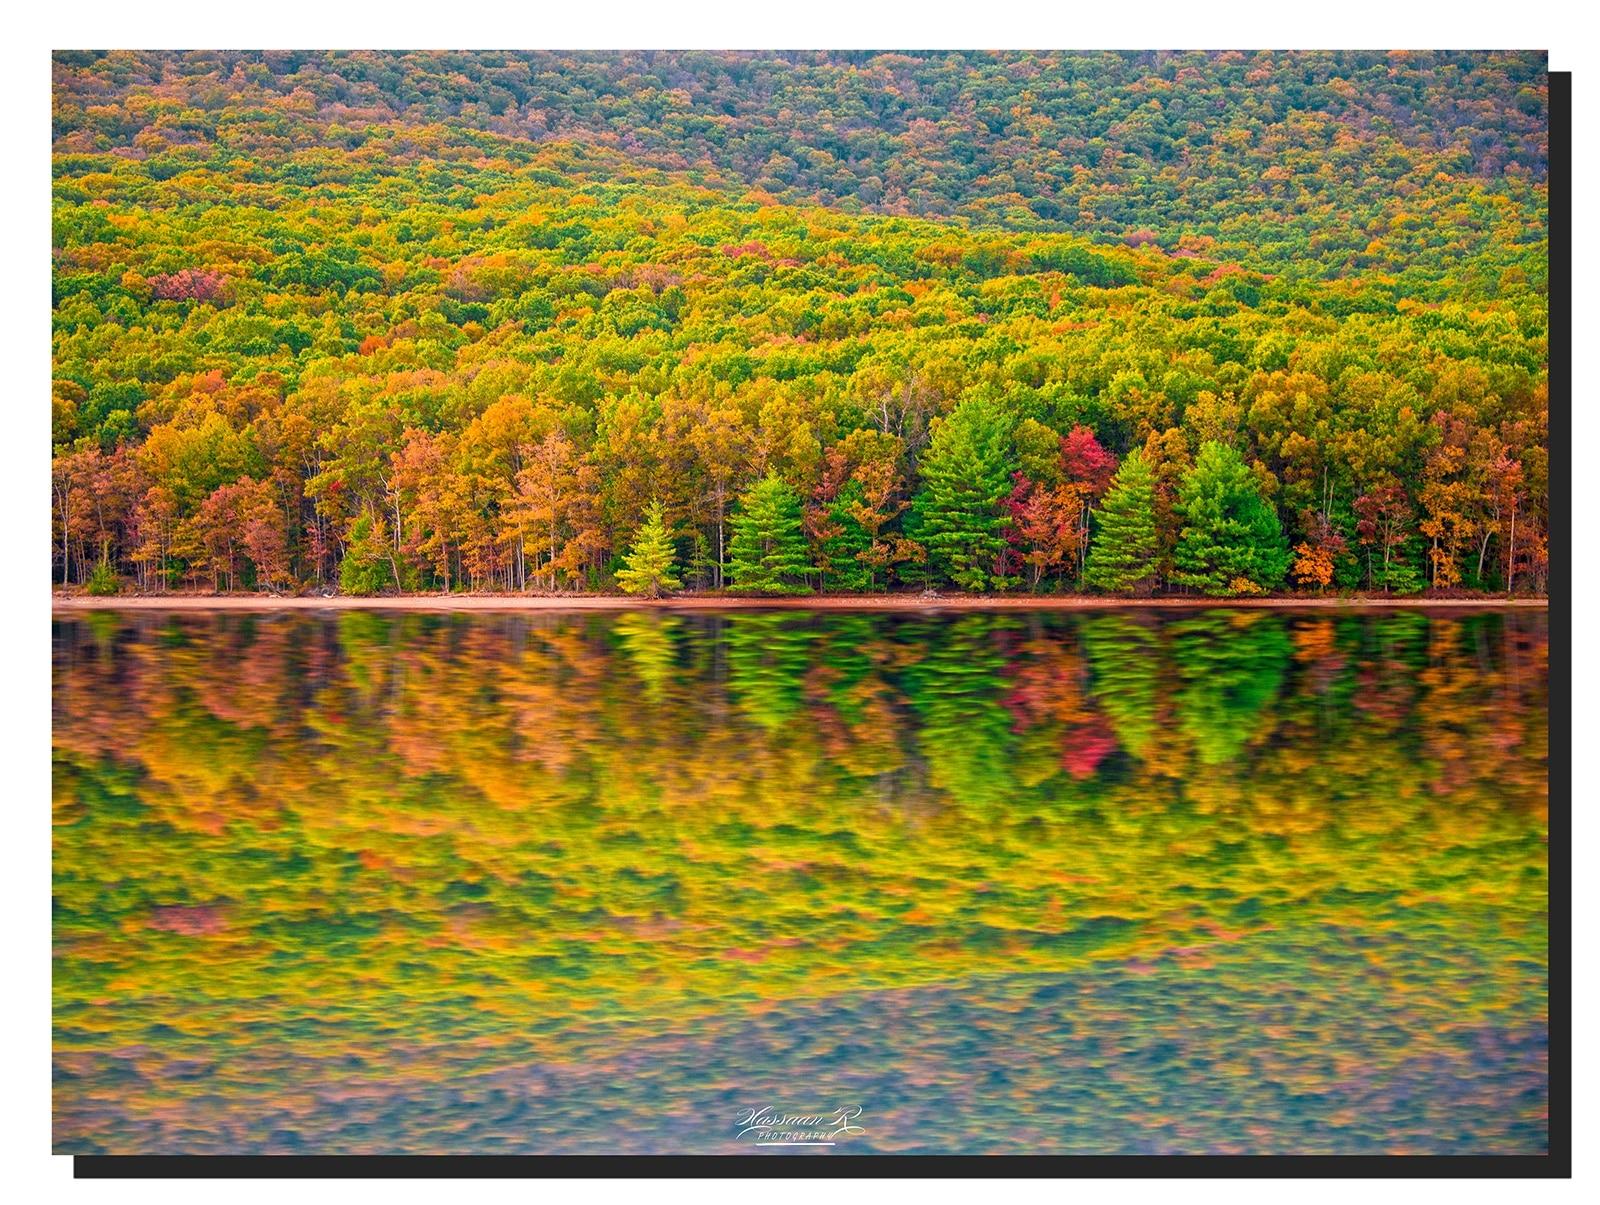 Rocky Gap State Park, Maryland, United States of America